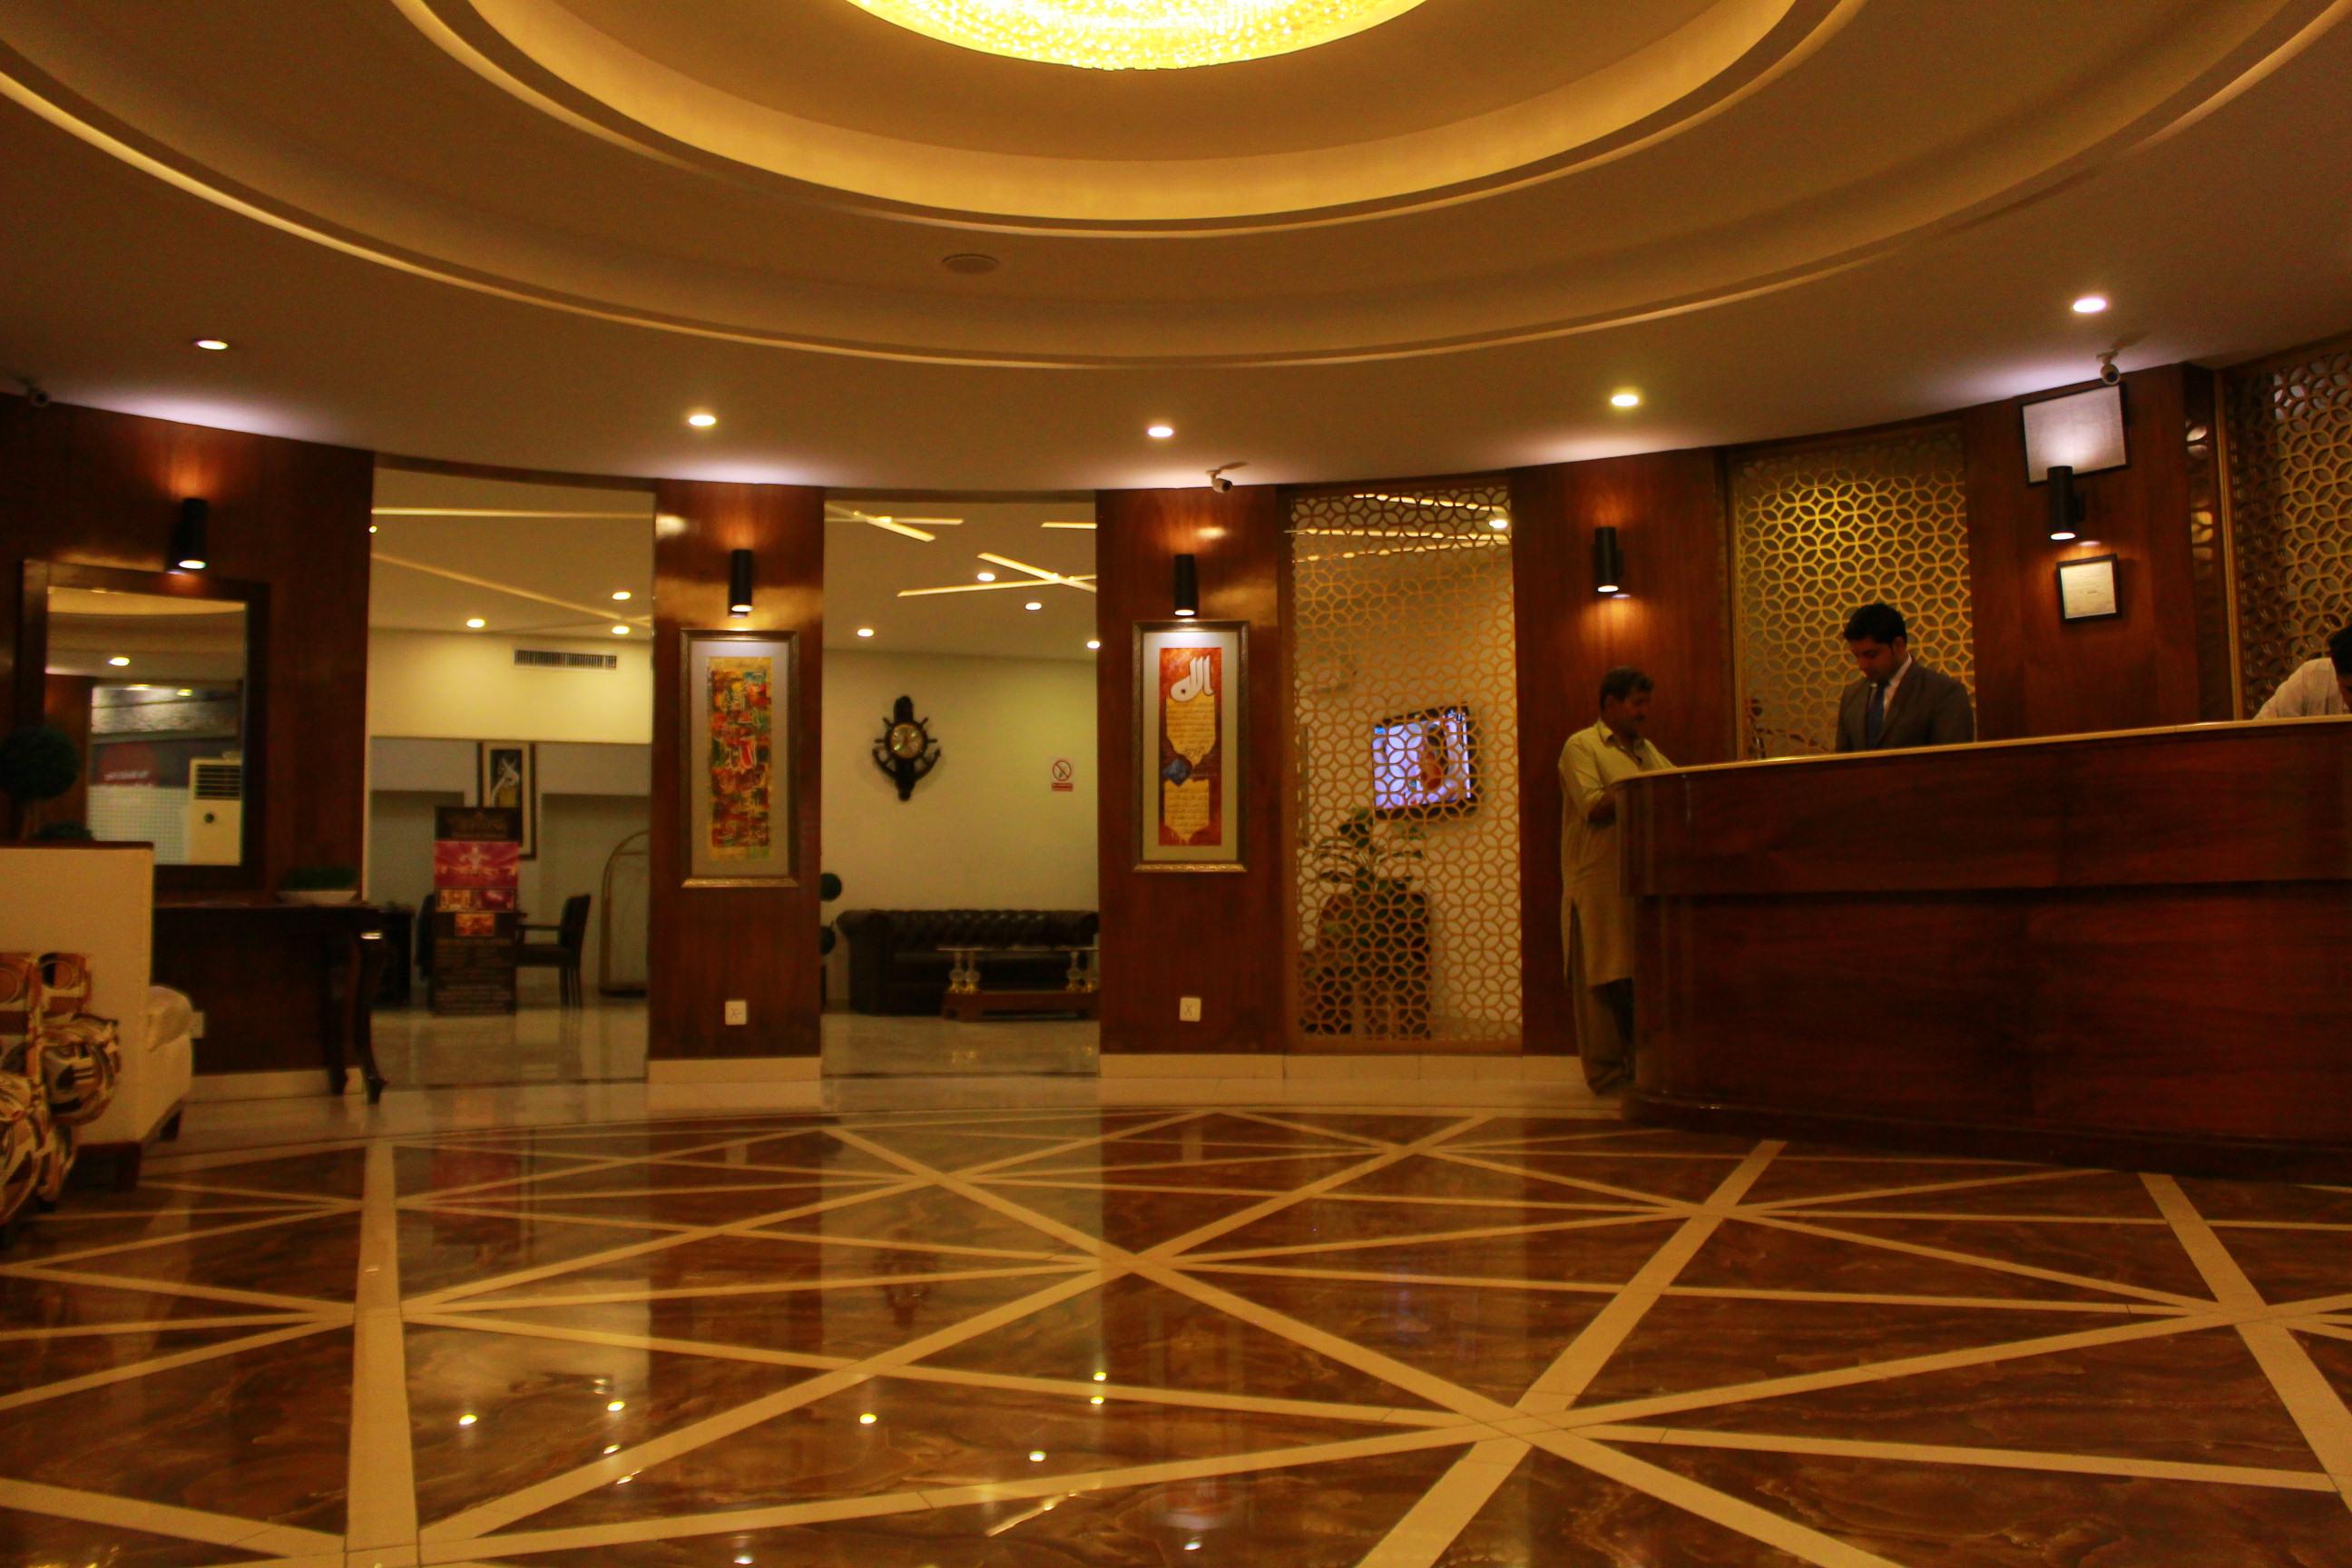 IMG 4417 - Hotel Hilton Suites: Not Worth Ignoring